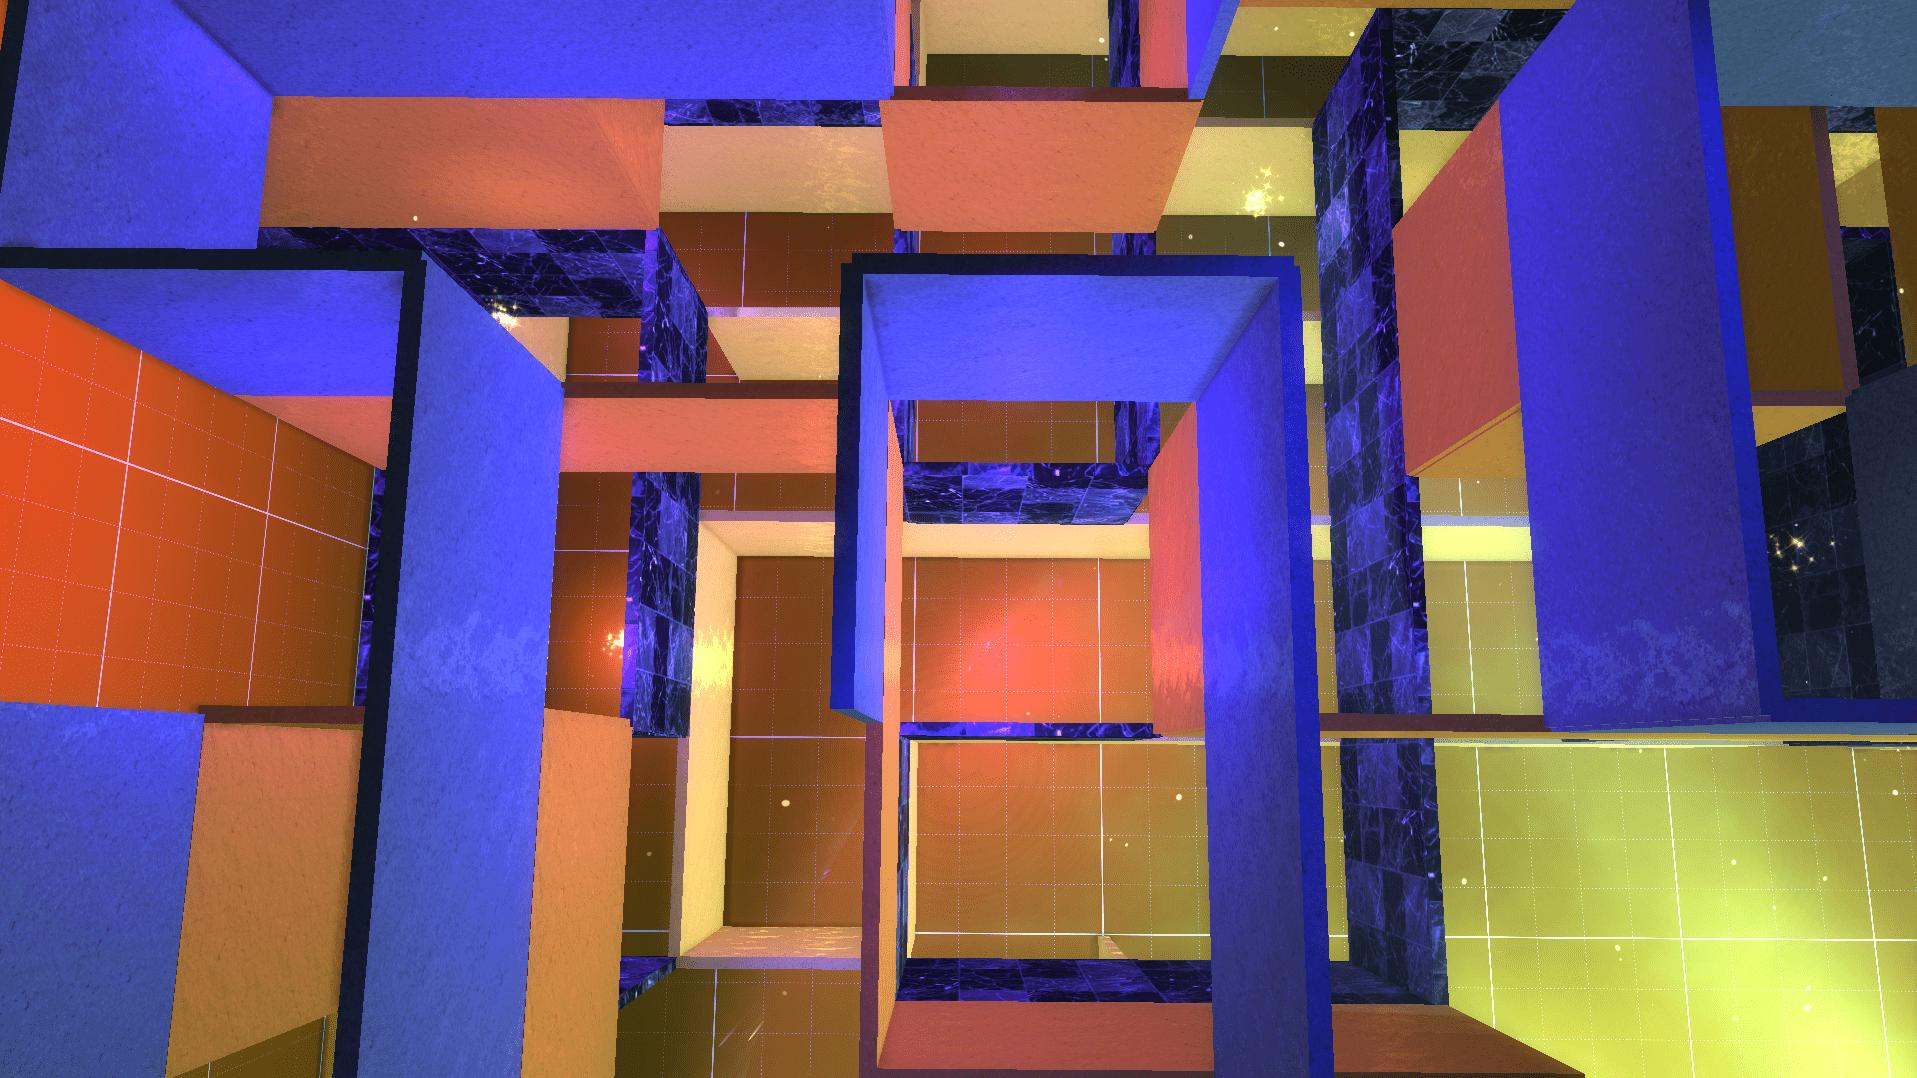 2020-08-16 (1)